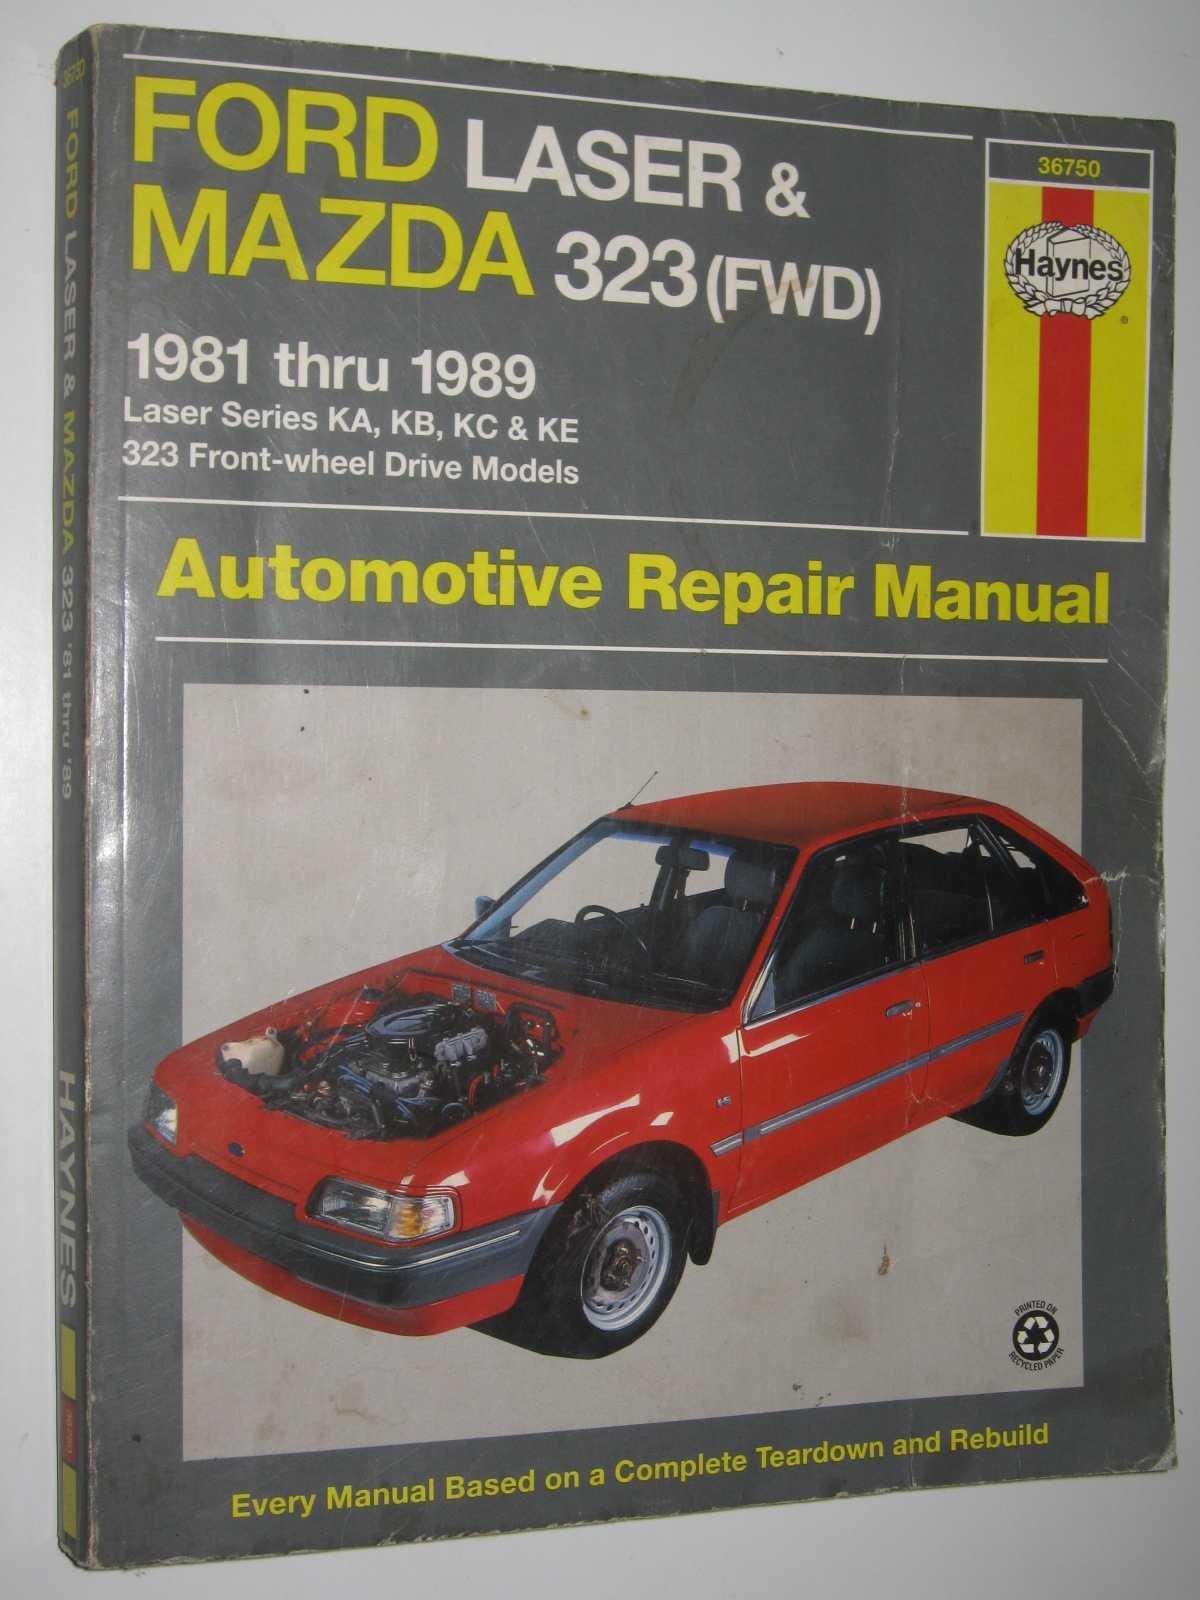 Ford Laser and Mazda 323 (FWD) Australian Automotive Repair Manual: 1981 to  1989 (Haynes Automotive Repair Manuals): Amazon.co.uk: L.Alan LeDoux, ...